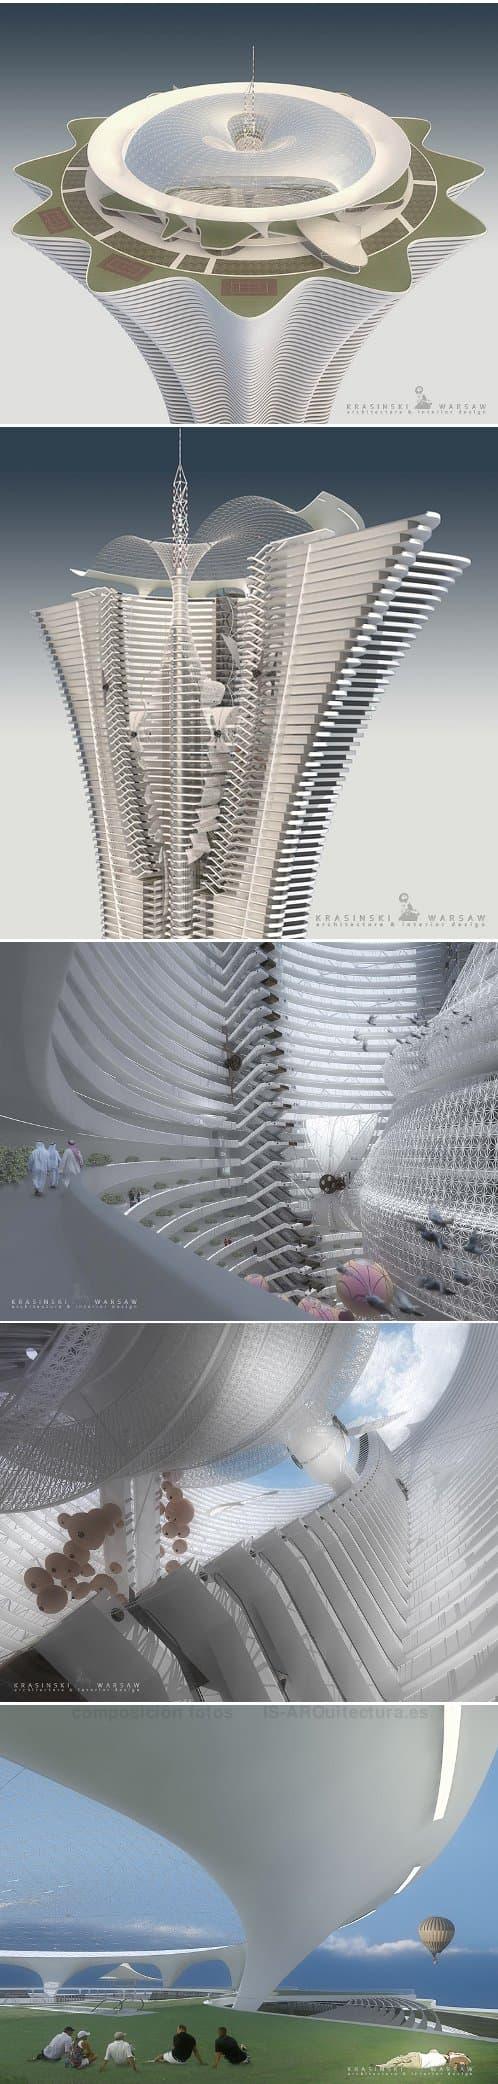 isla-artificial-rascacielos-krasinski